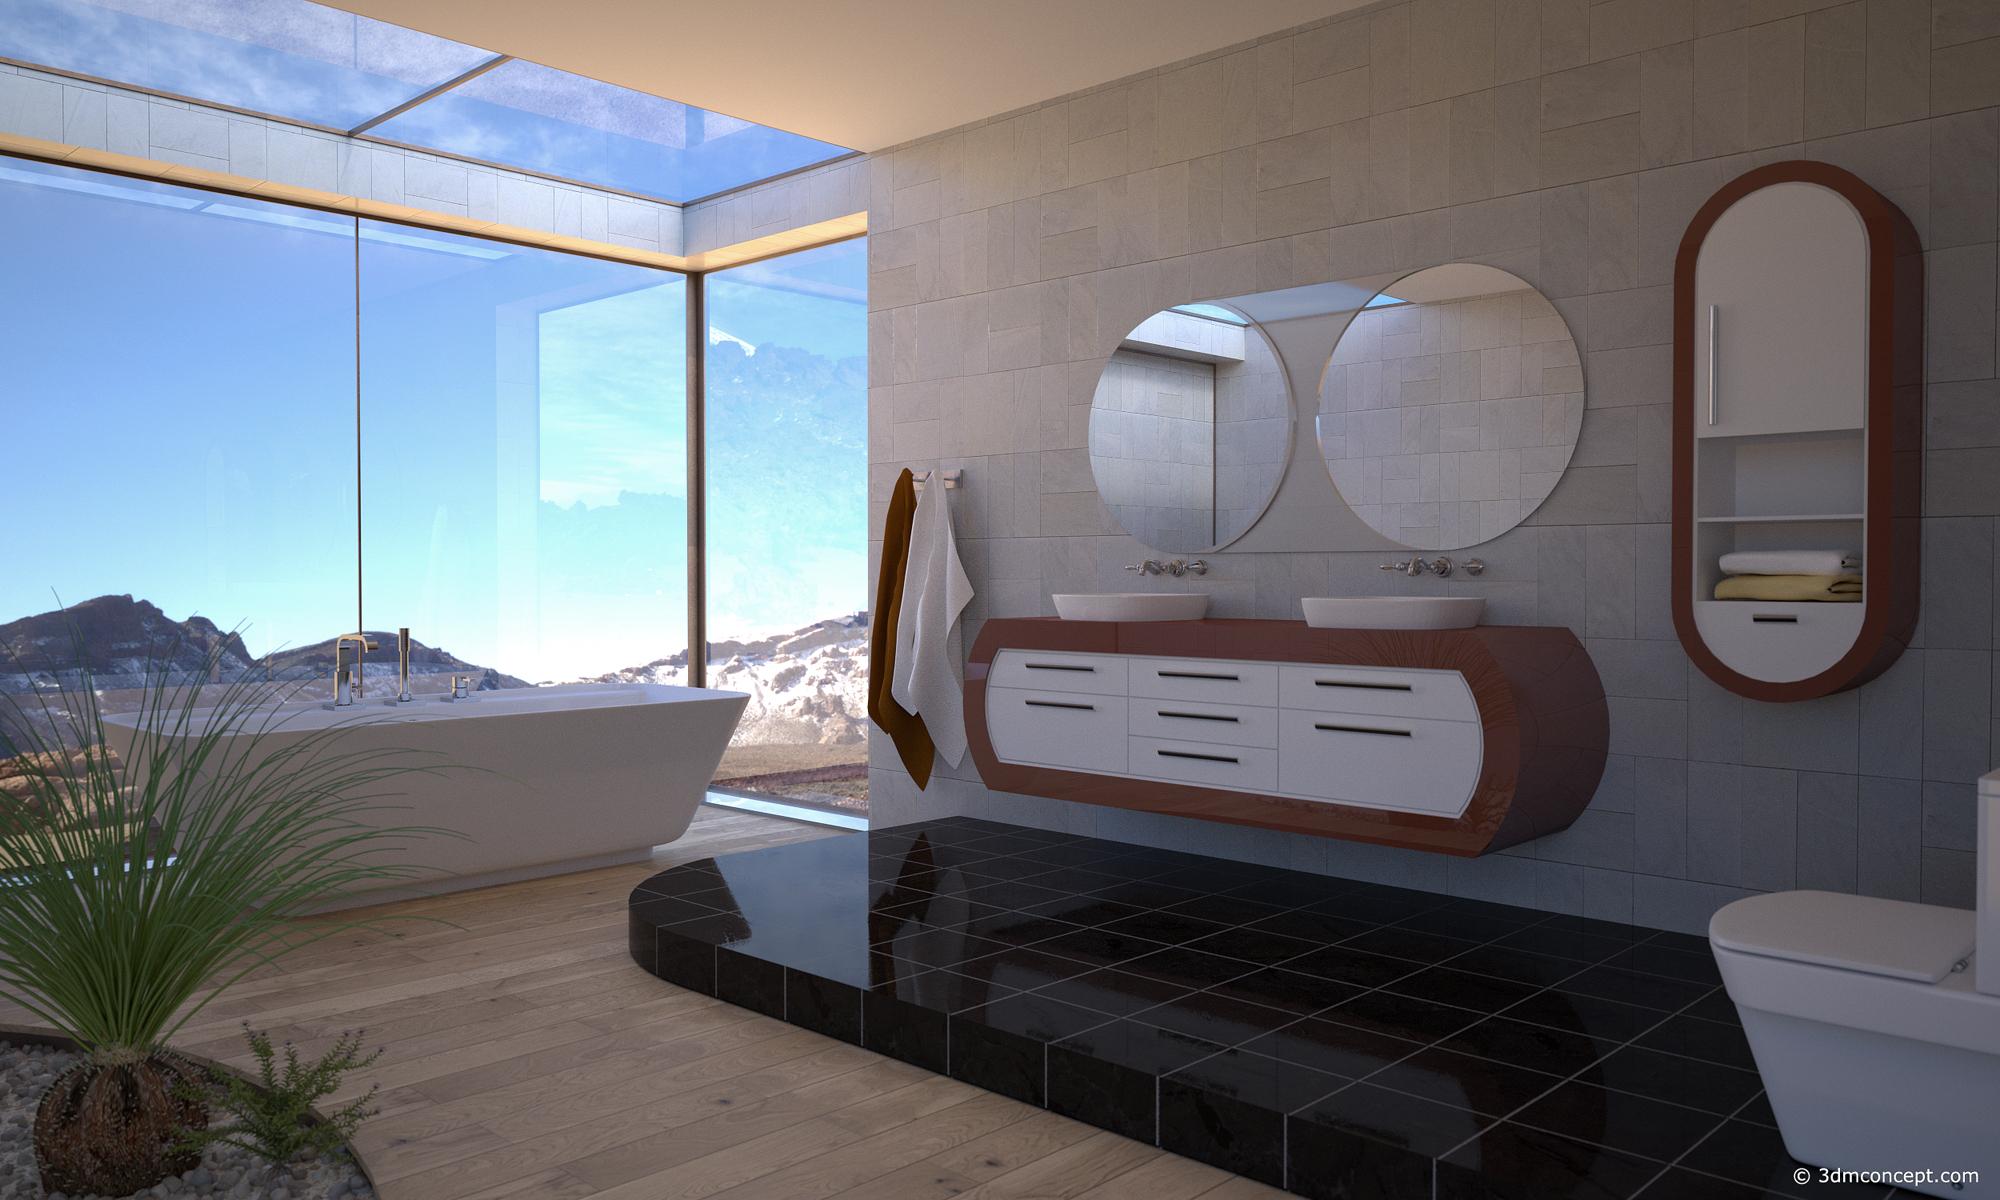 3dmconcept - Interior Visualization